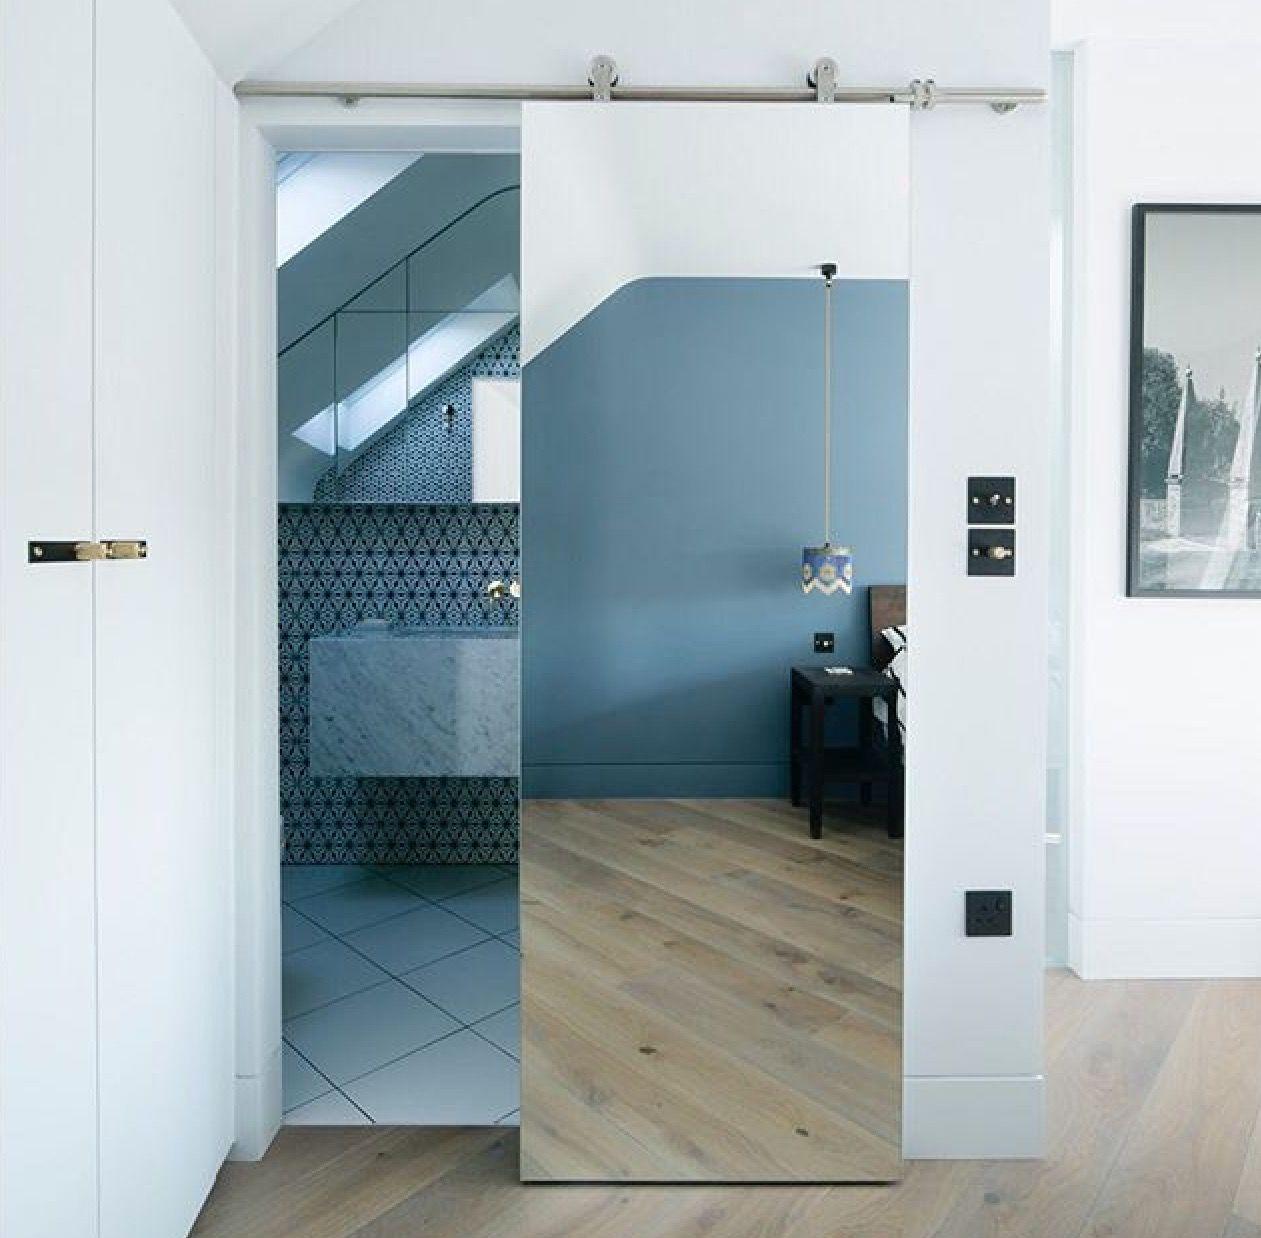 New Mirrored Barn Door Porta De Vidro Porta De Espelho Portas